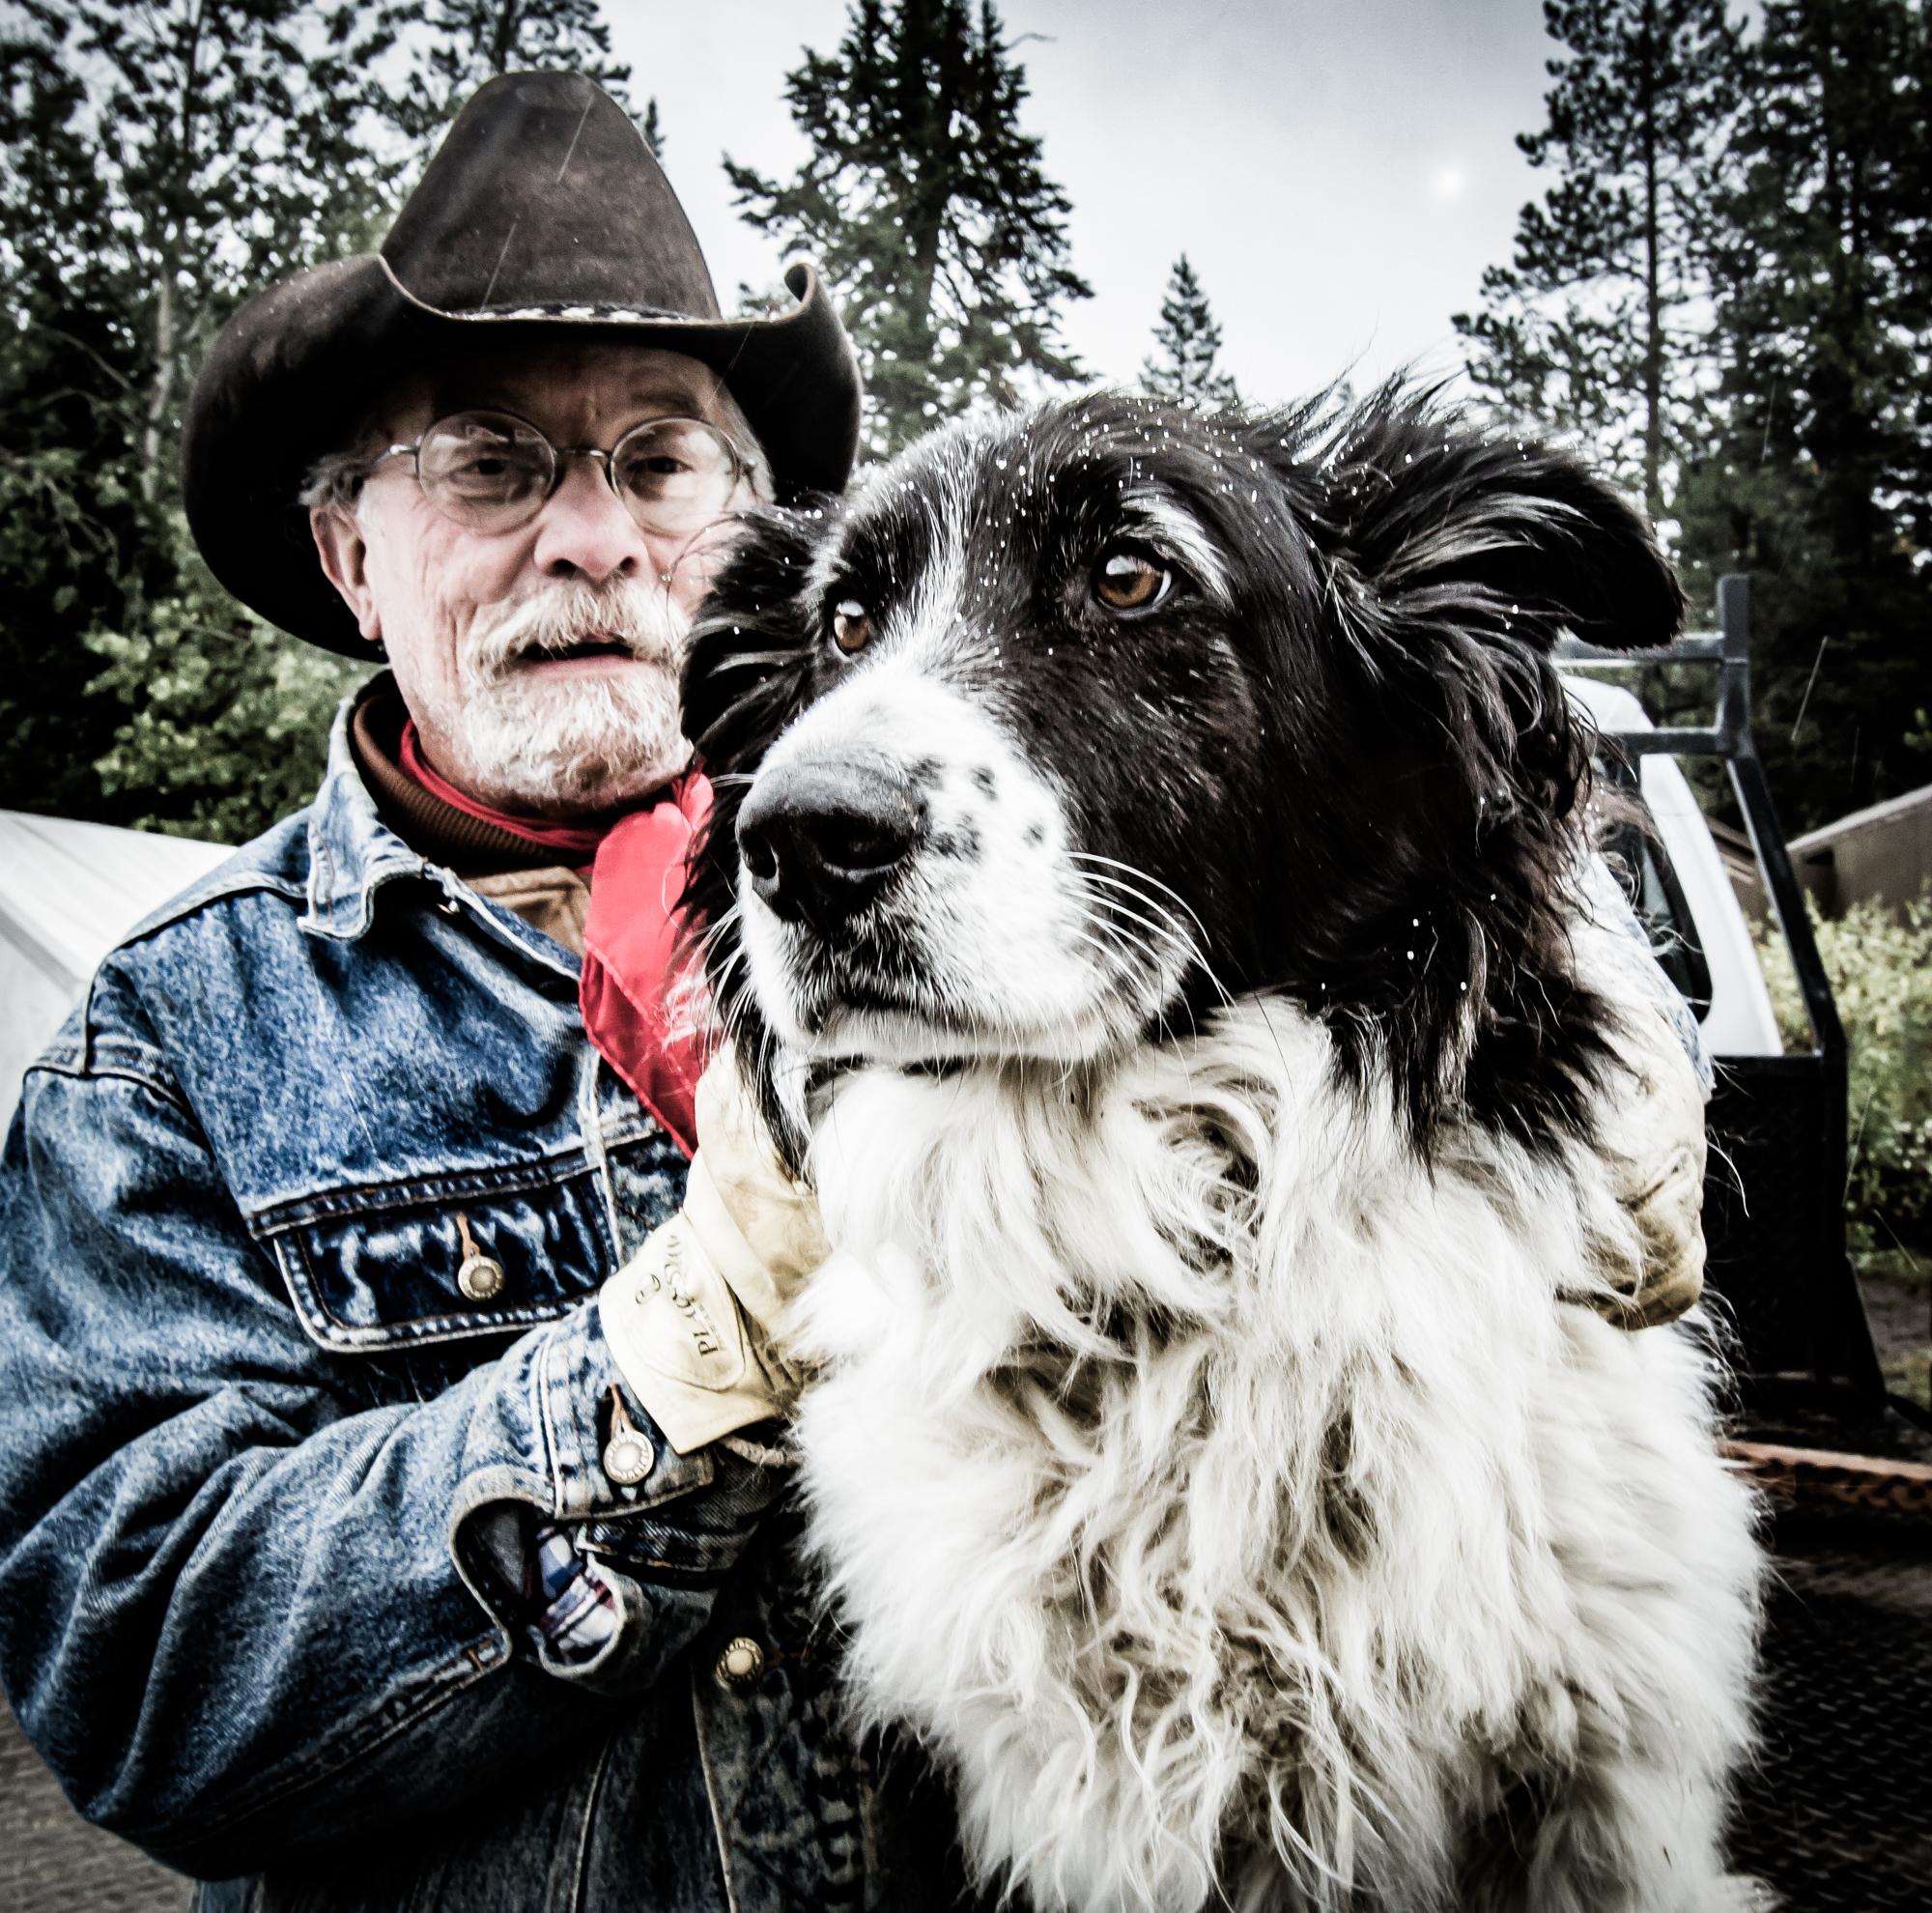 rick-meoli-commercial-photographer-outdoor-animal-lifestyle-repheads-10